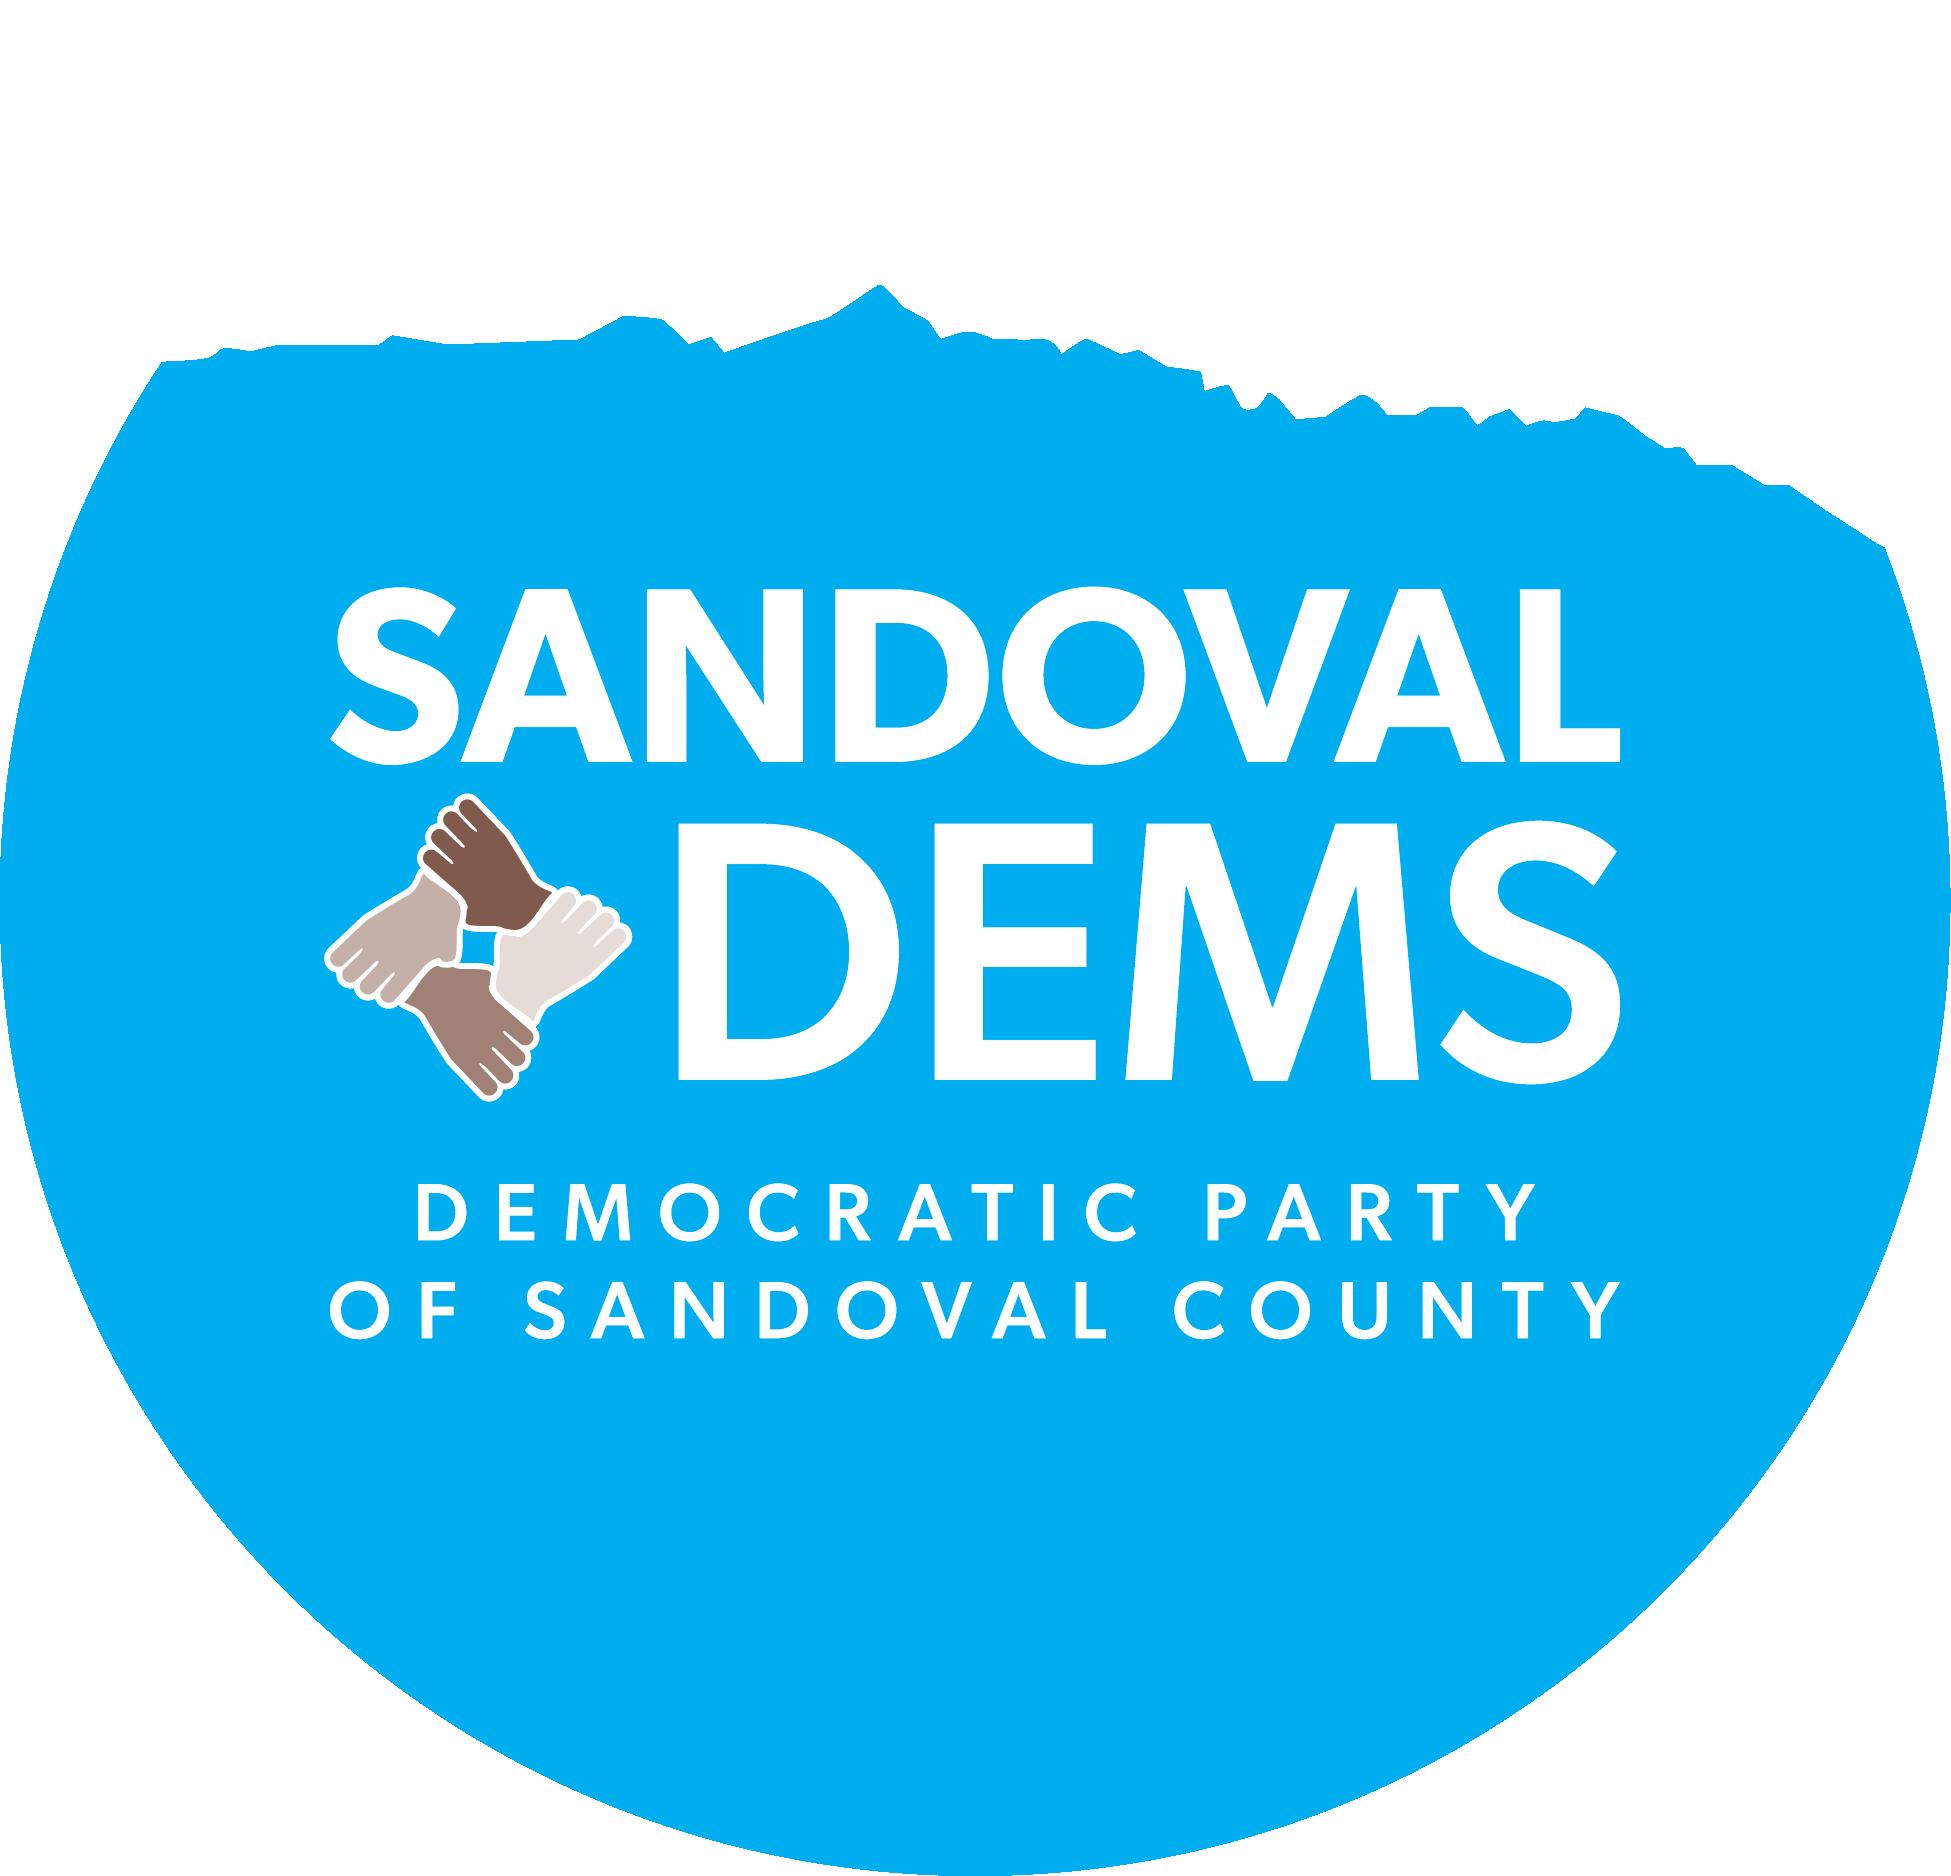 Democratic Party of Sandoval County